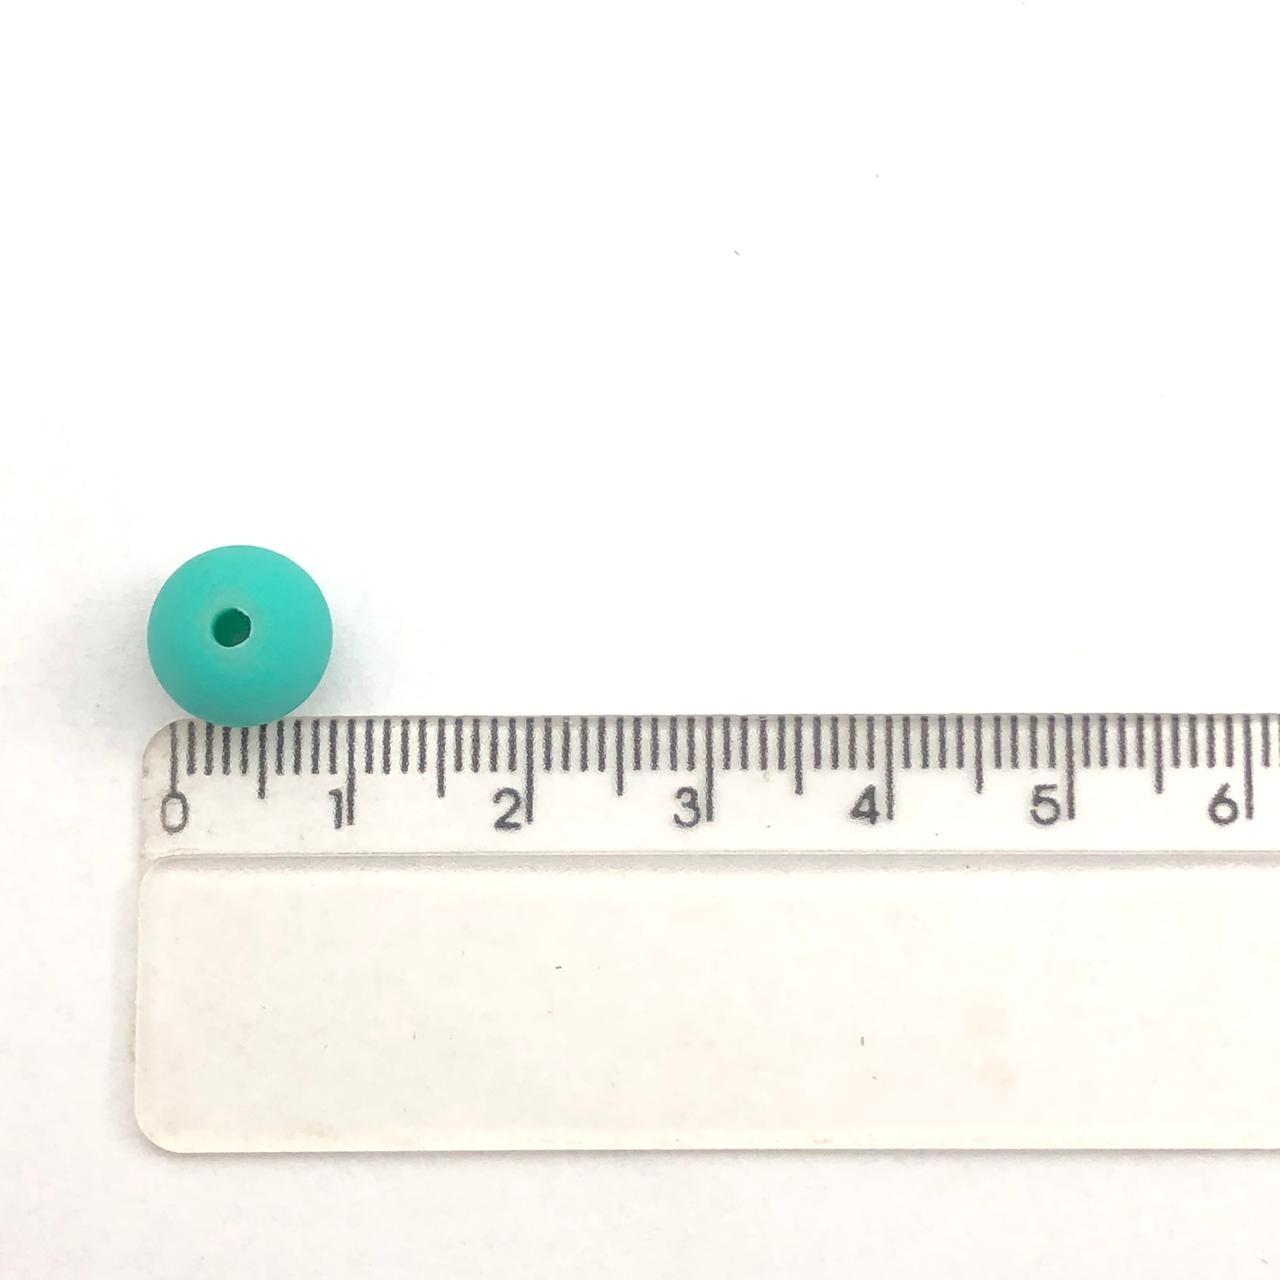 BOL09 - Bola Emborrachada Turquesa 10mm - 20Gr